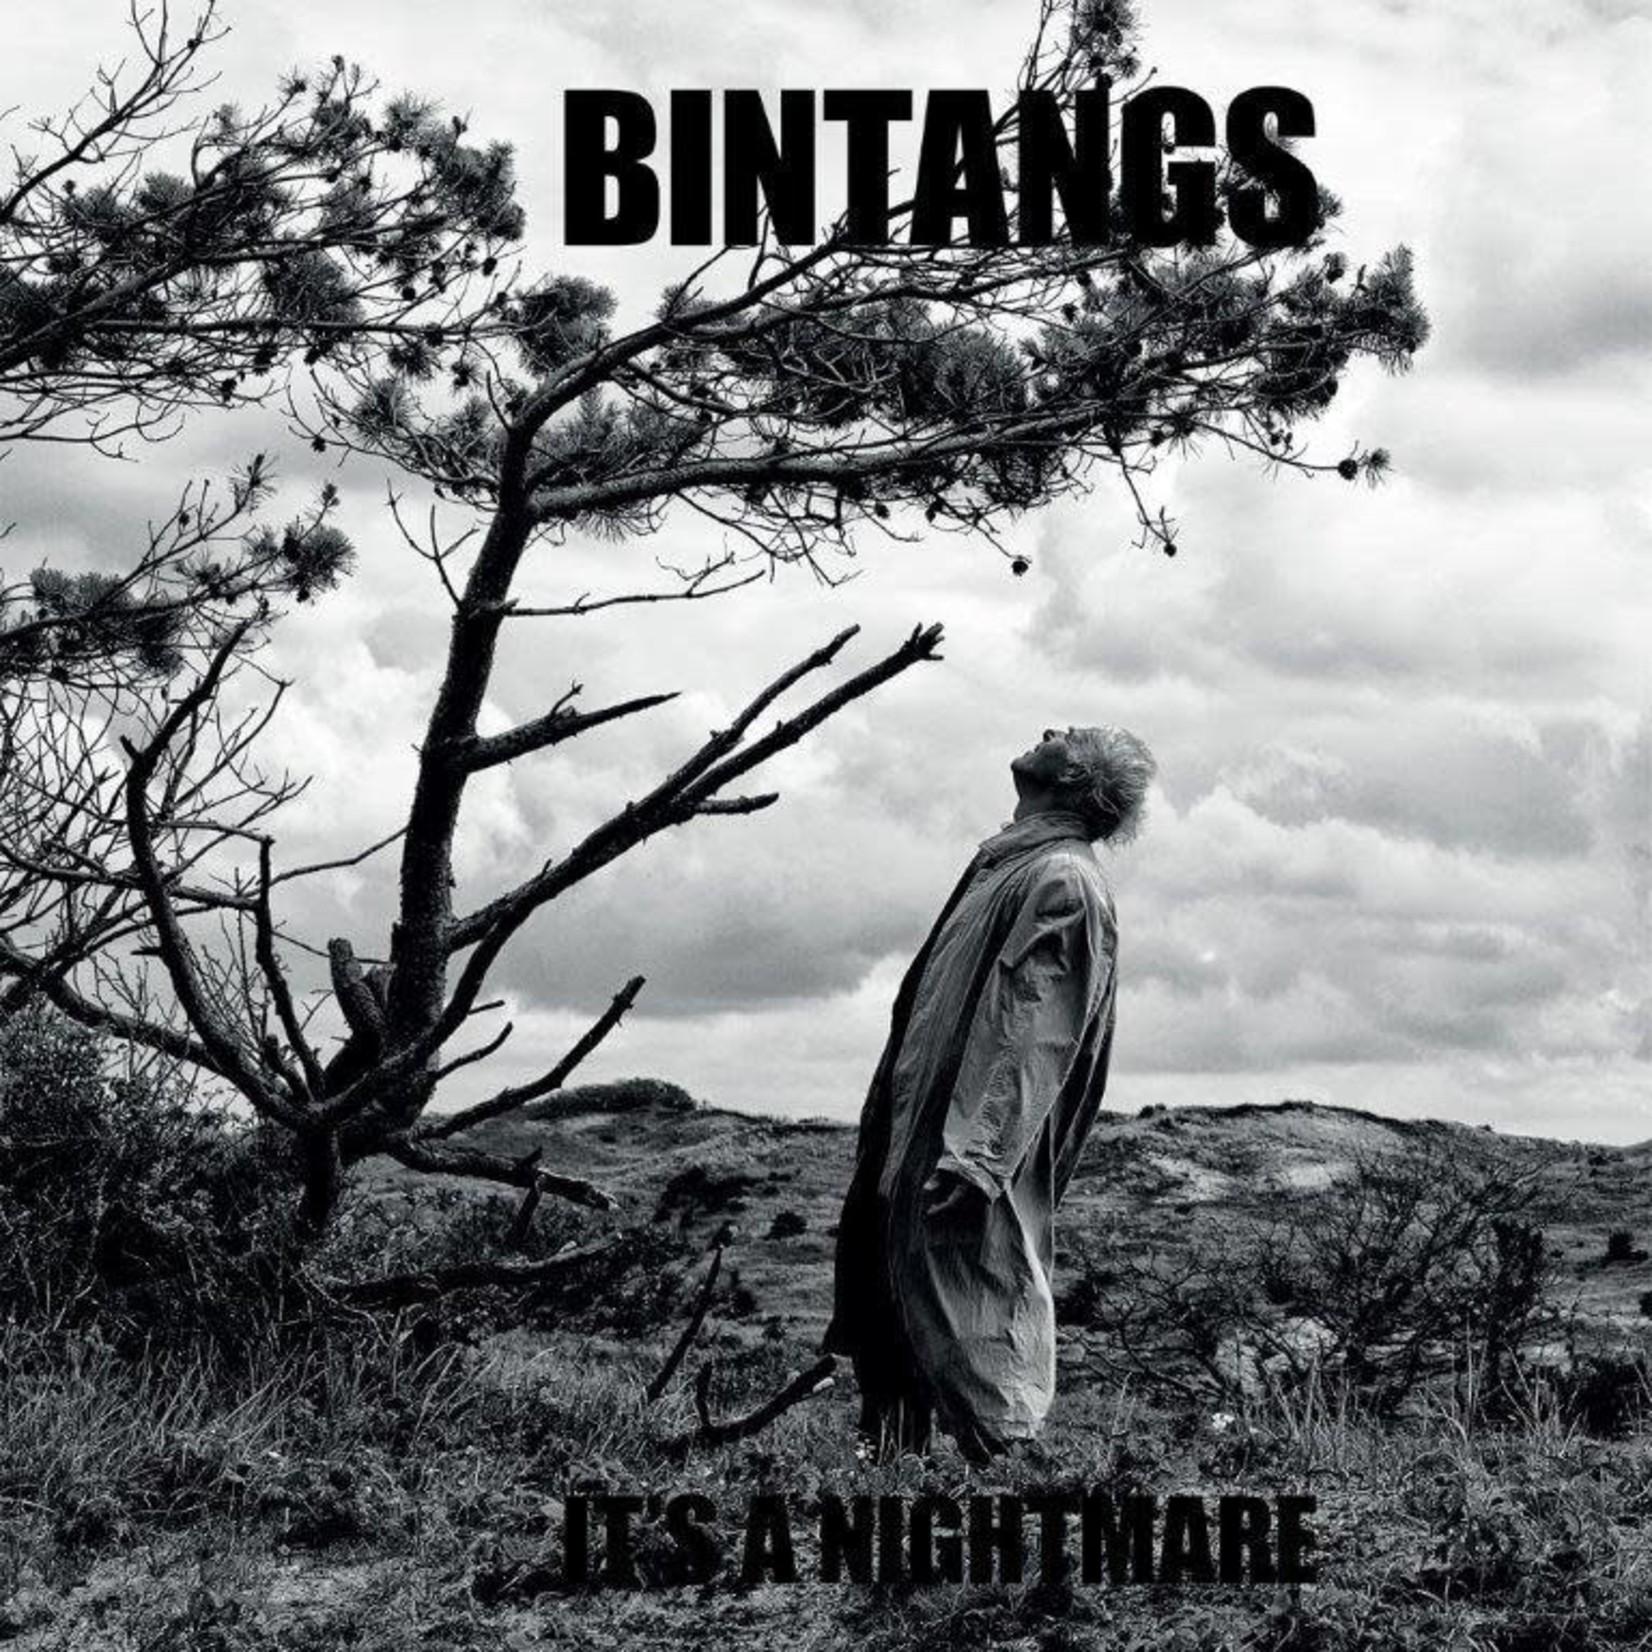 Bintangs - It's a Nightmare (VINYL)